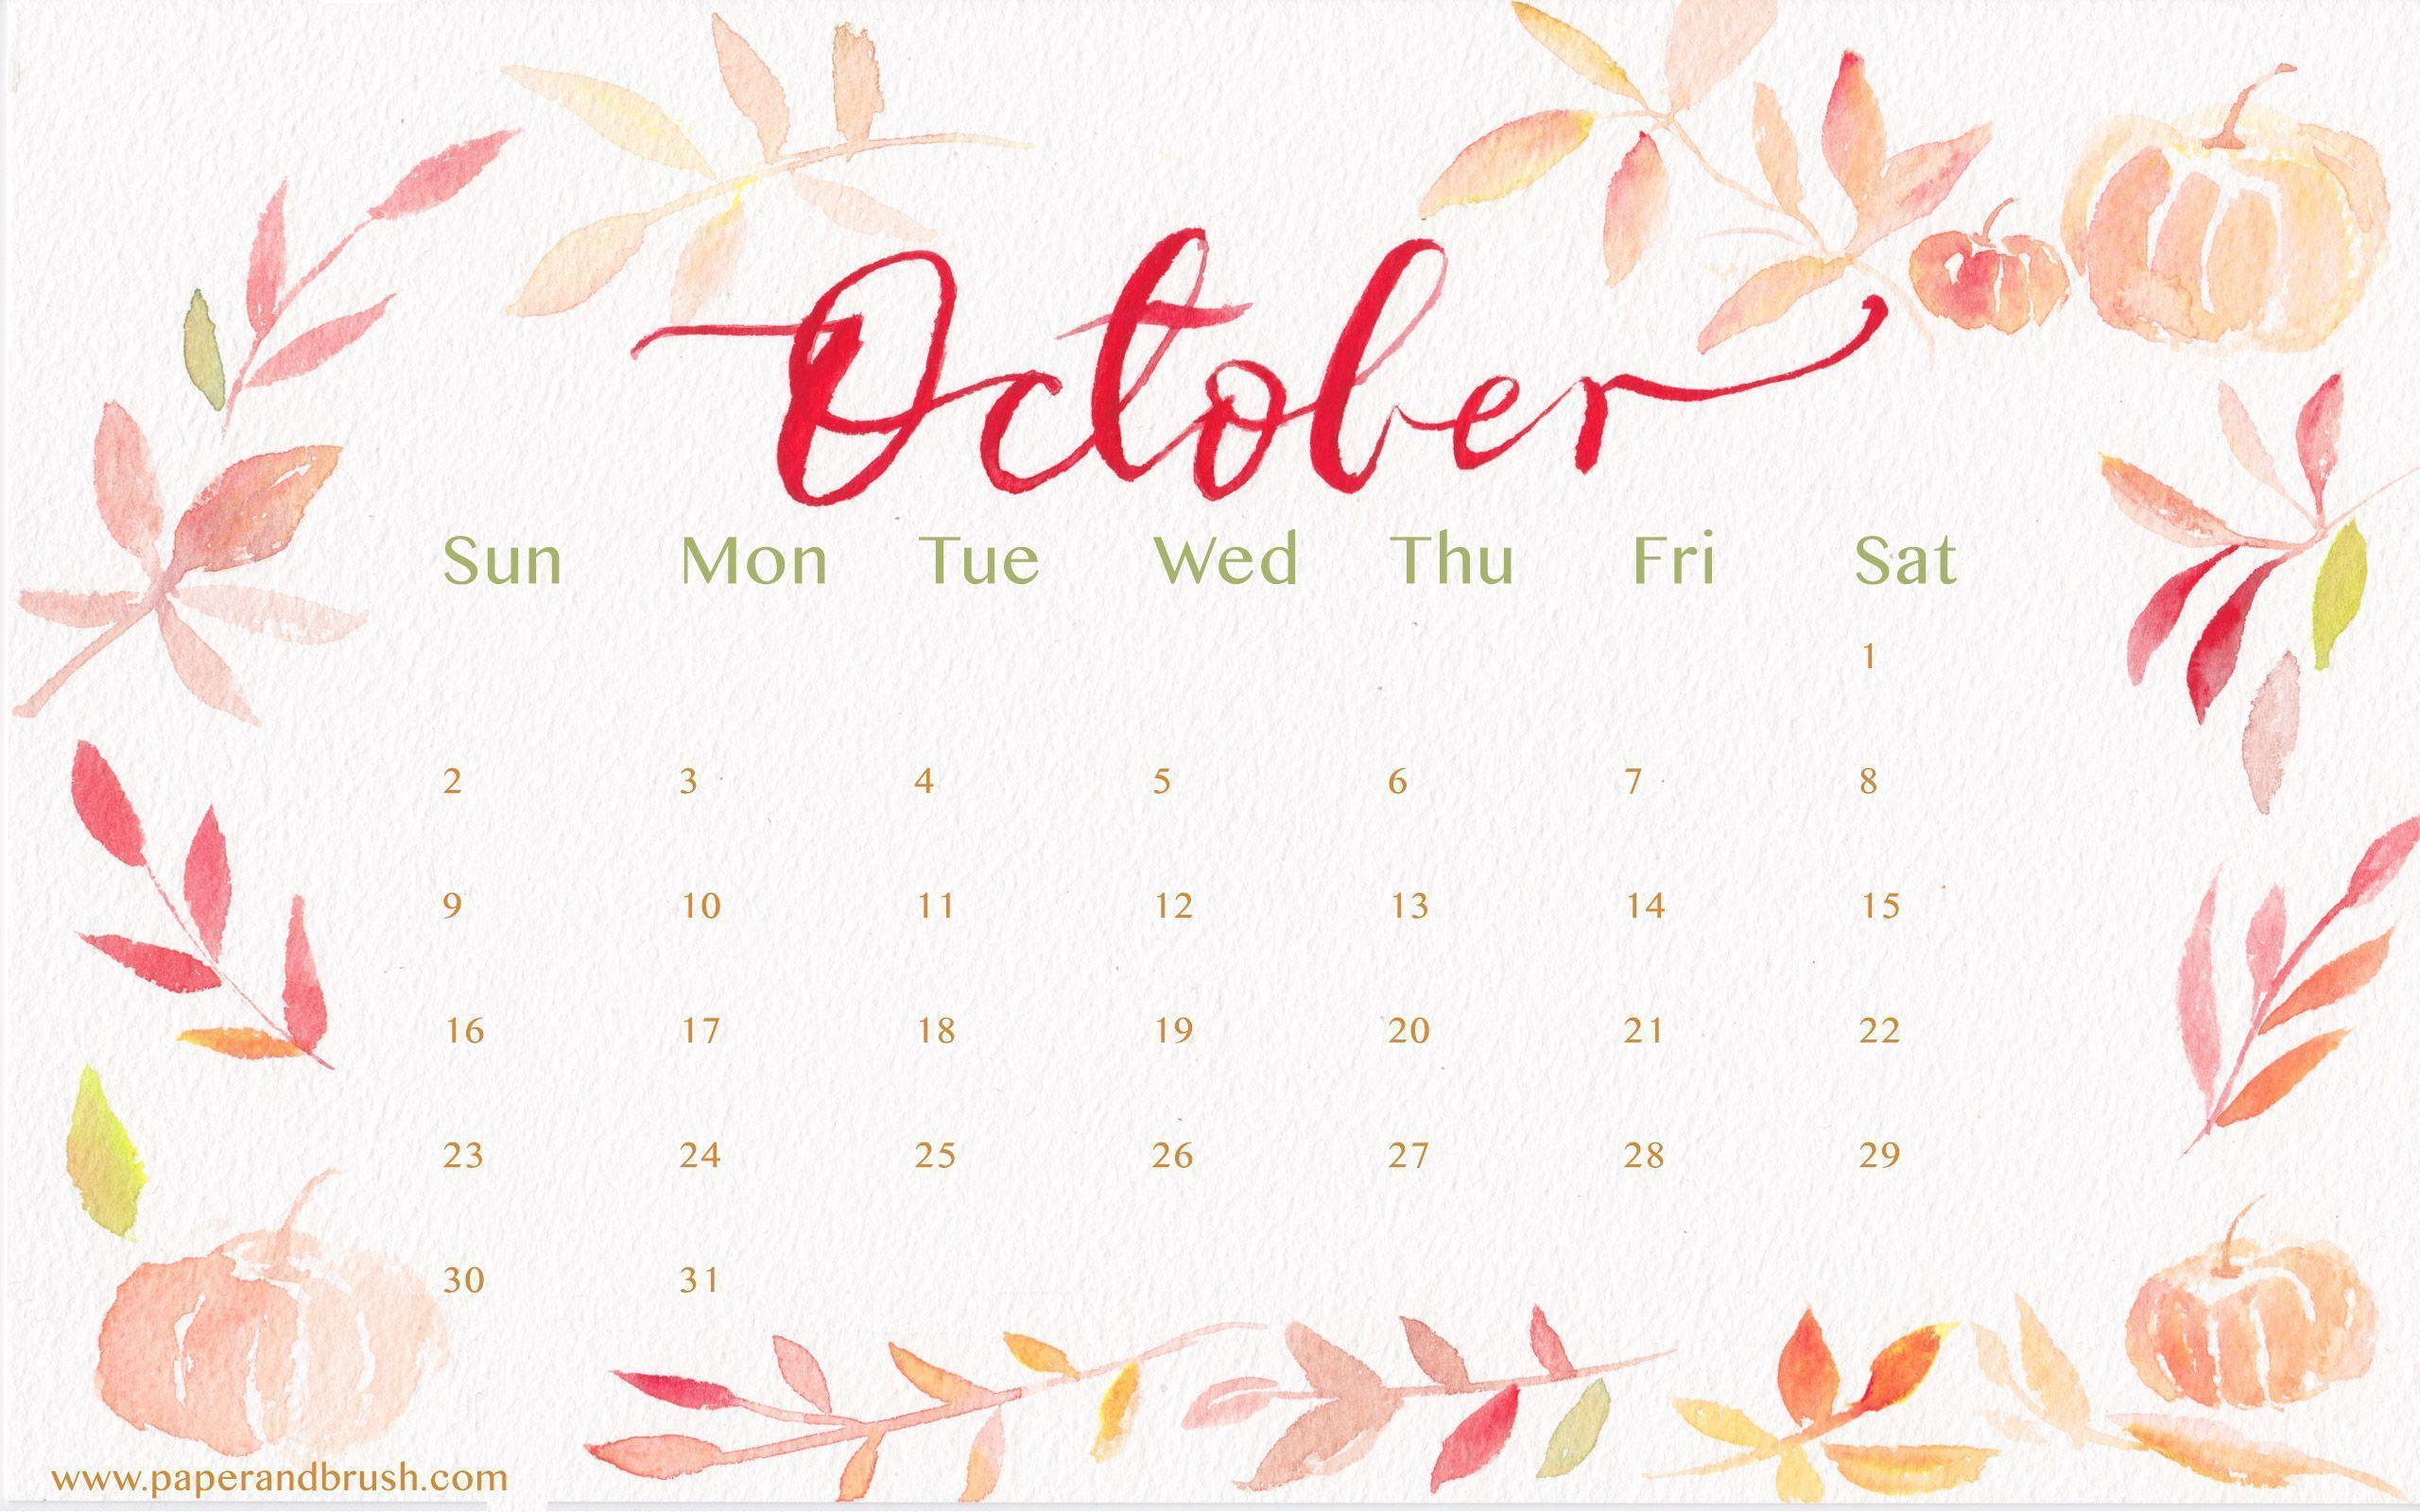 October Calendar Wallpaper Iphone : Desktop wallpapers calendar october wallpaper cave